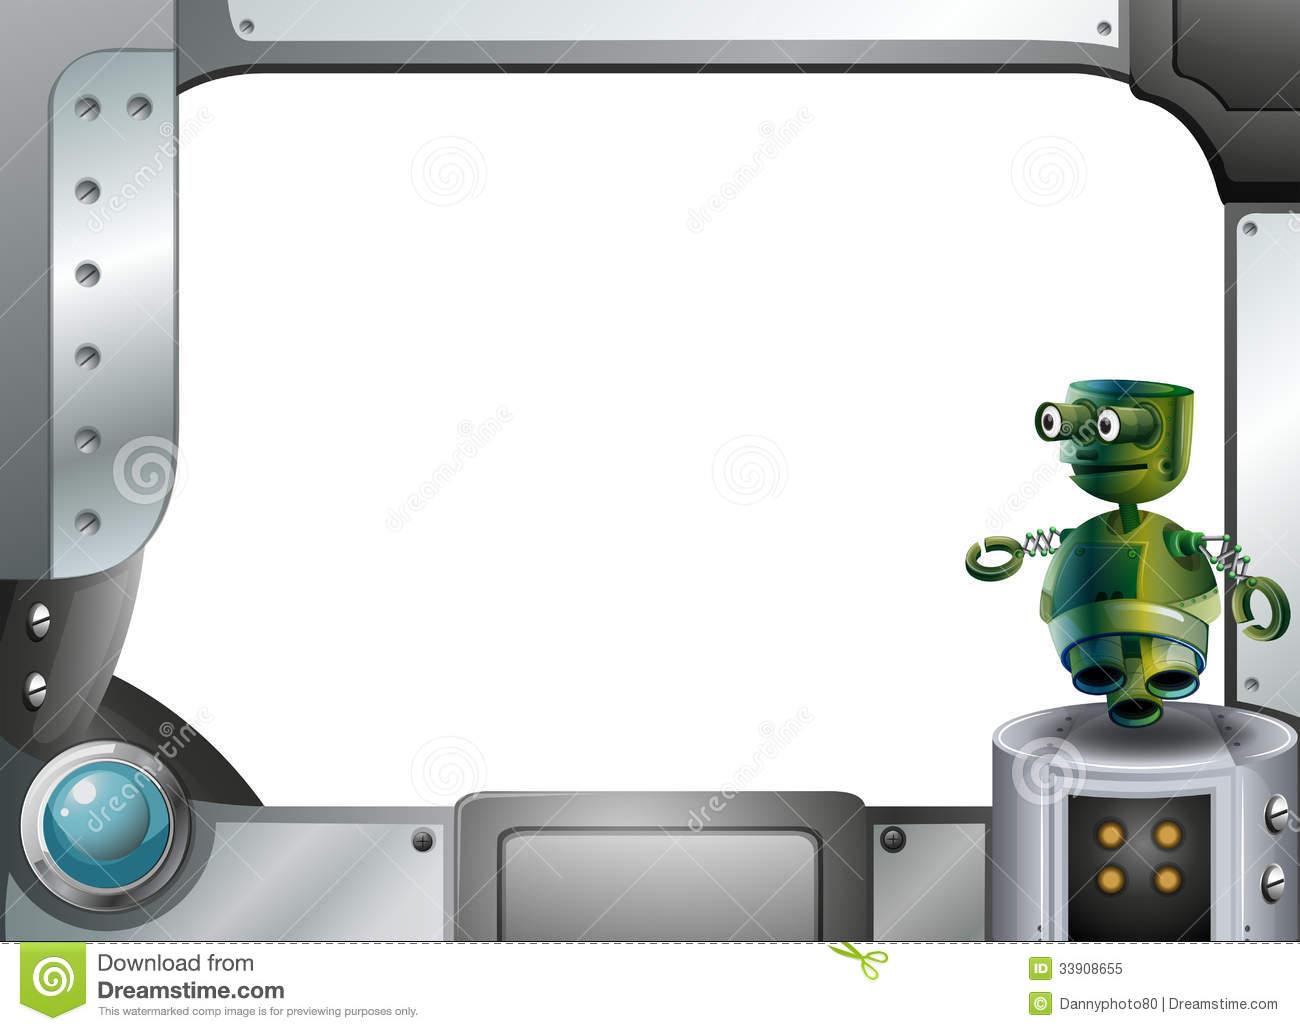 Robot clipart border Robot border Clipart border Download